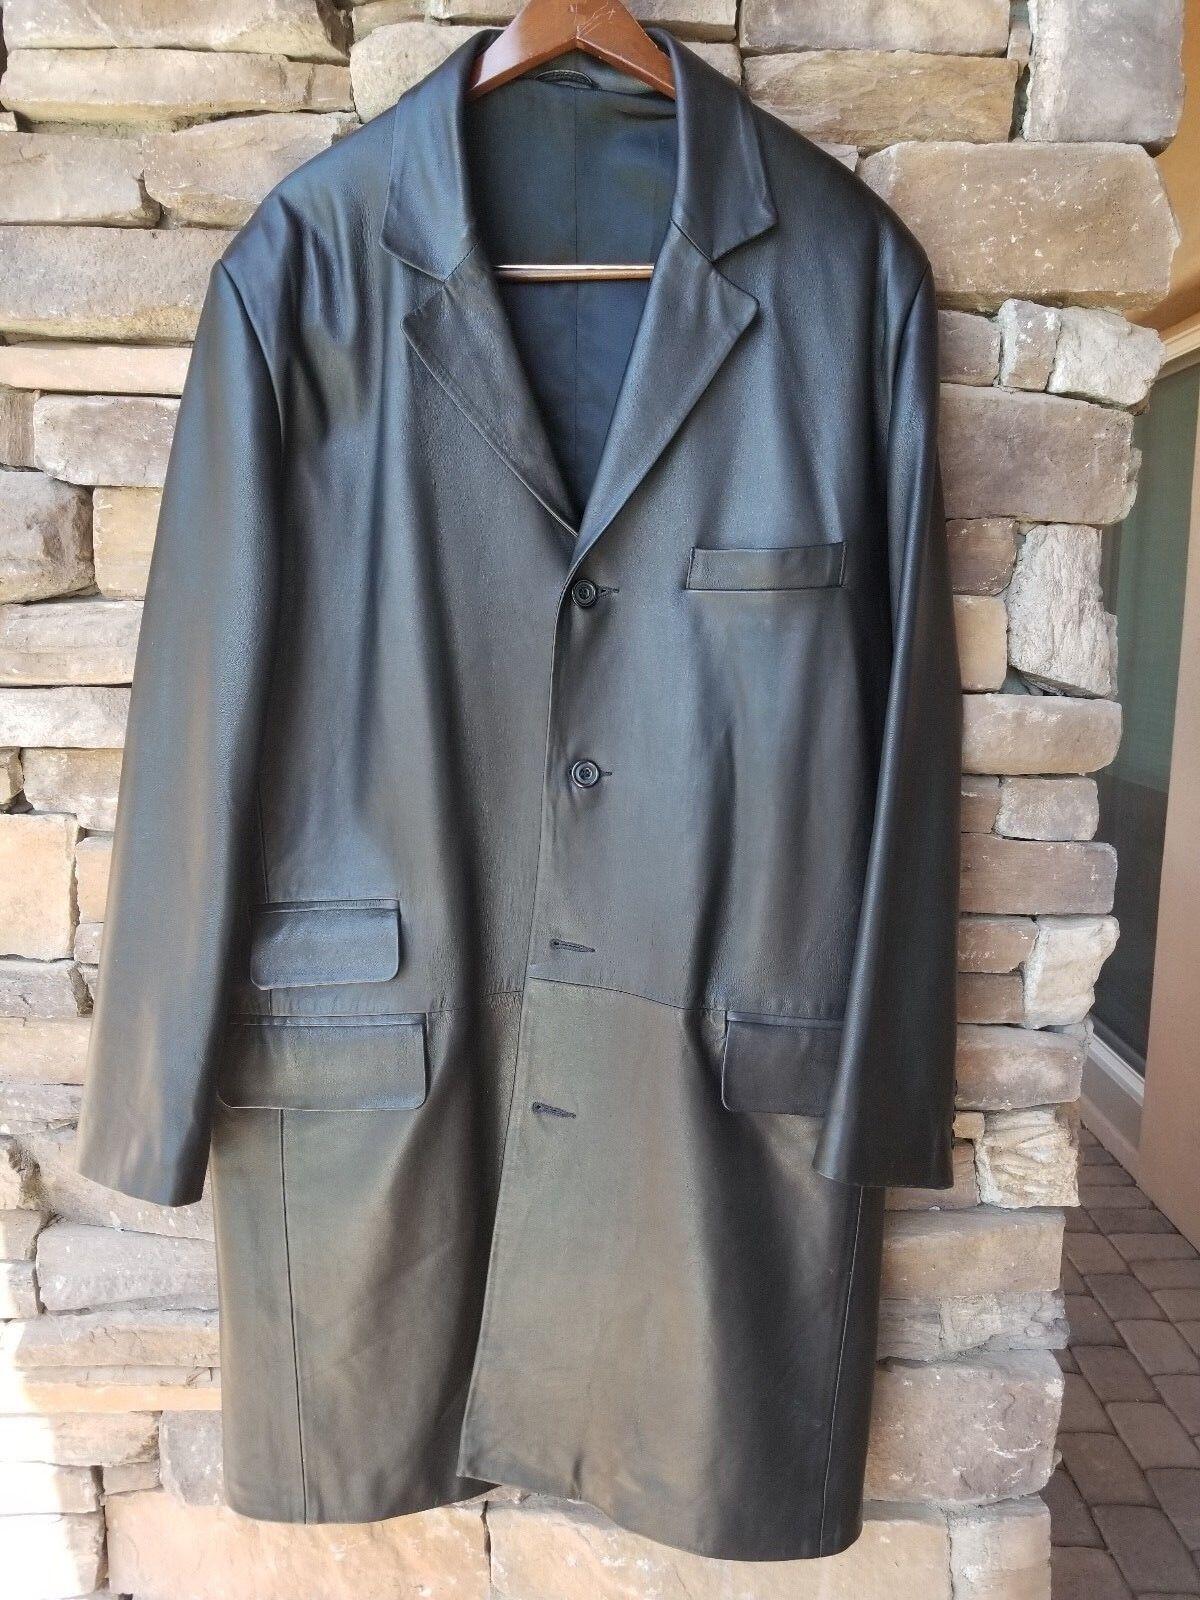 Men's Fine Lambskin Leather, 3 4 Length Coat